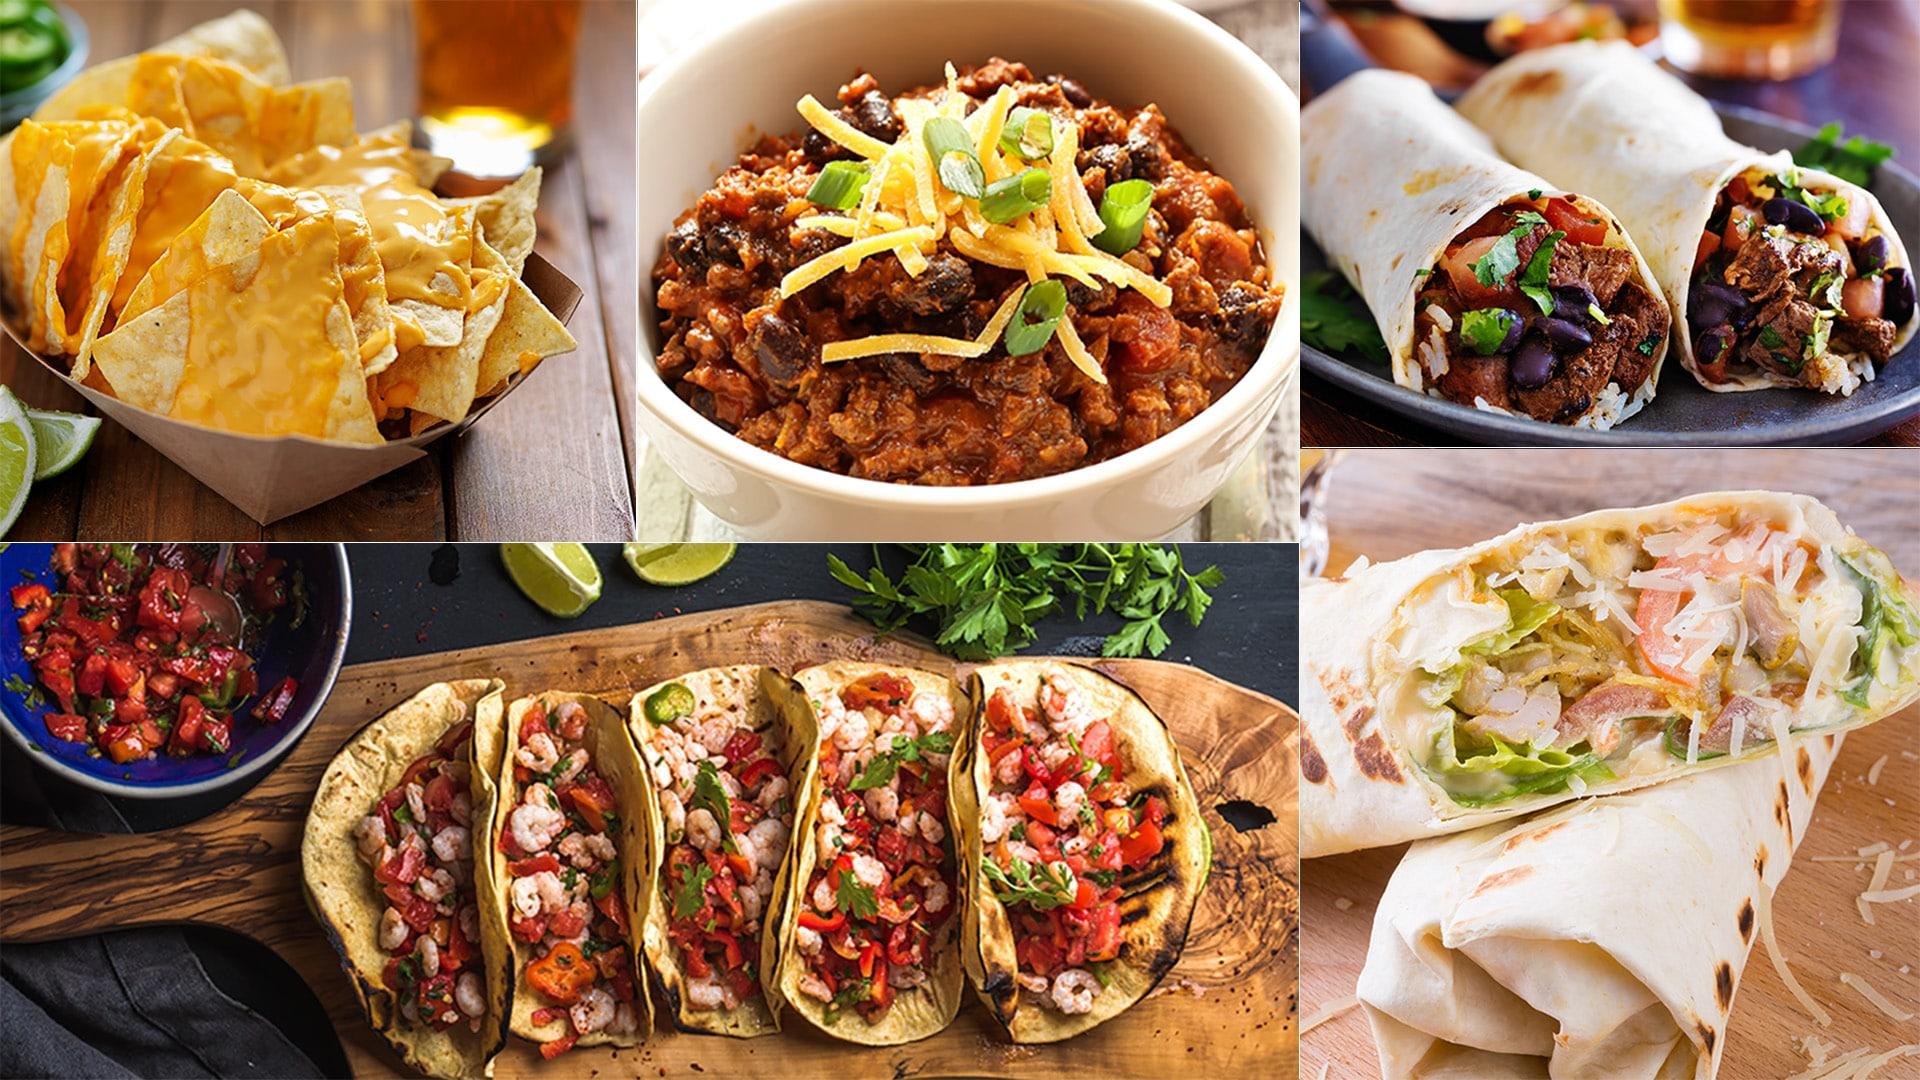 Mejores restaurantes de comida mexicana en Las Vegas